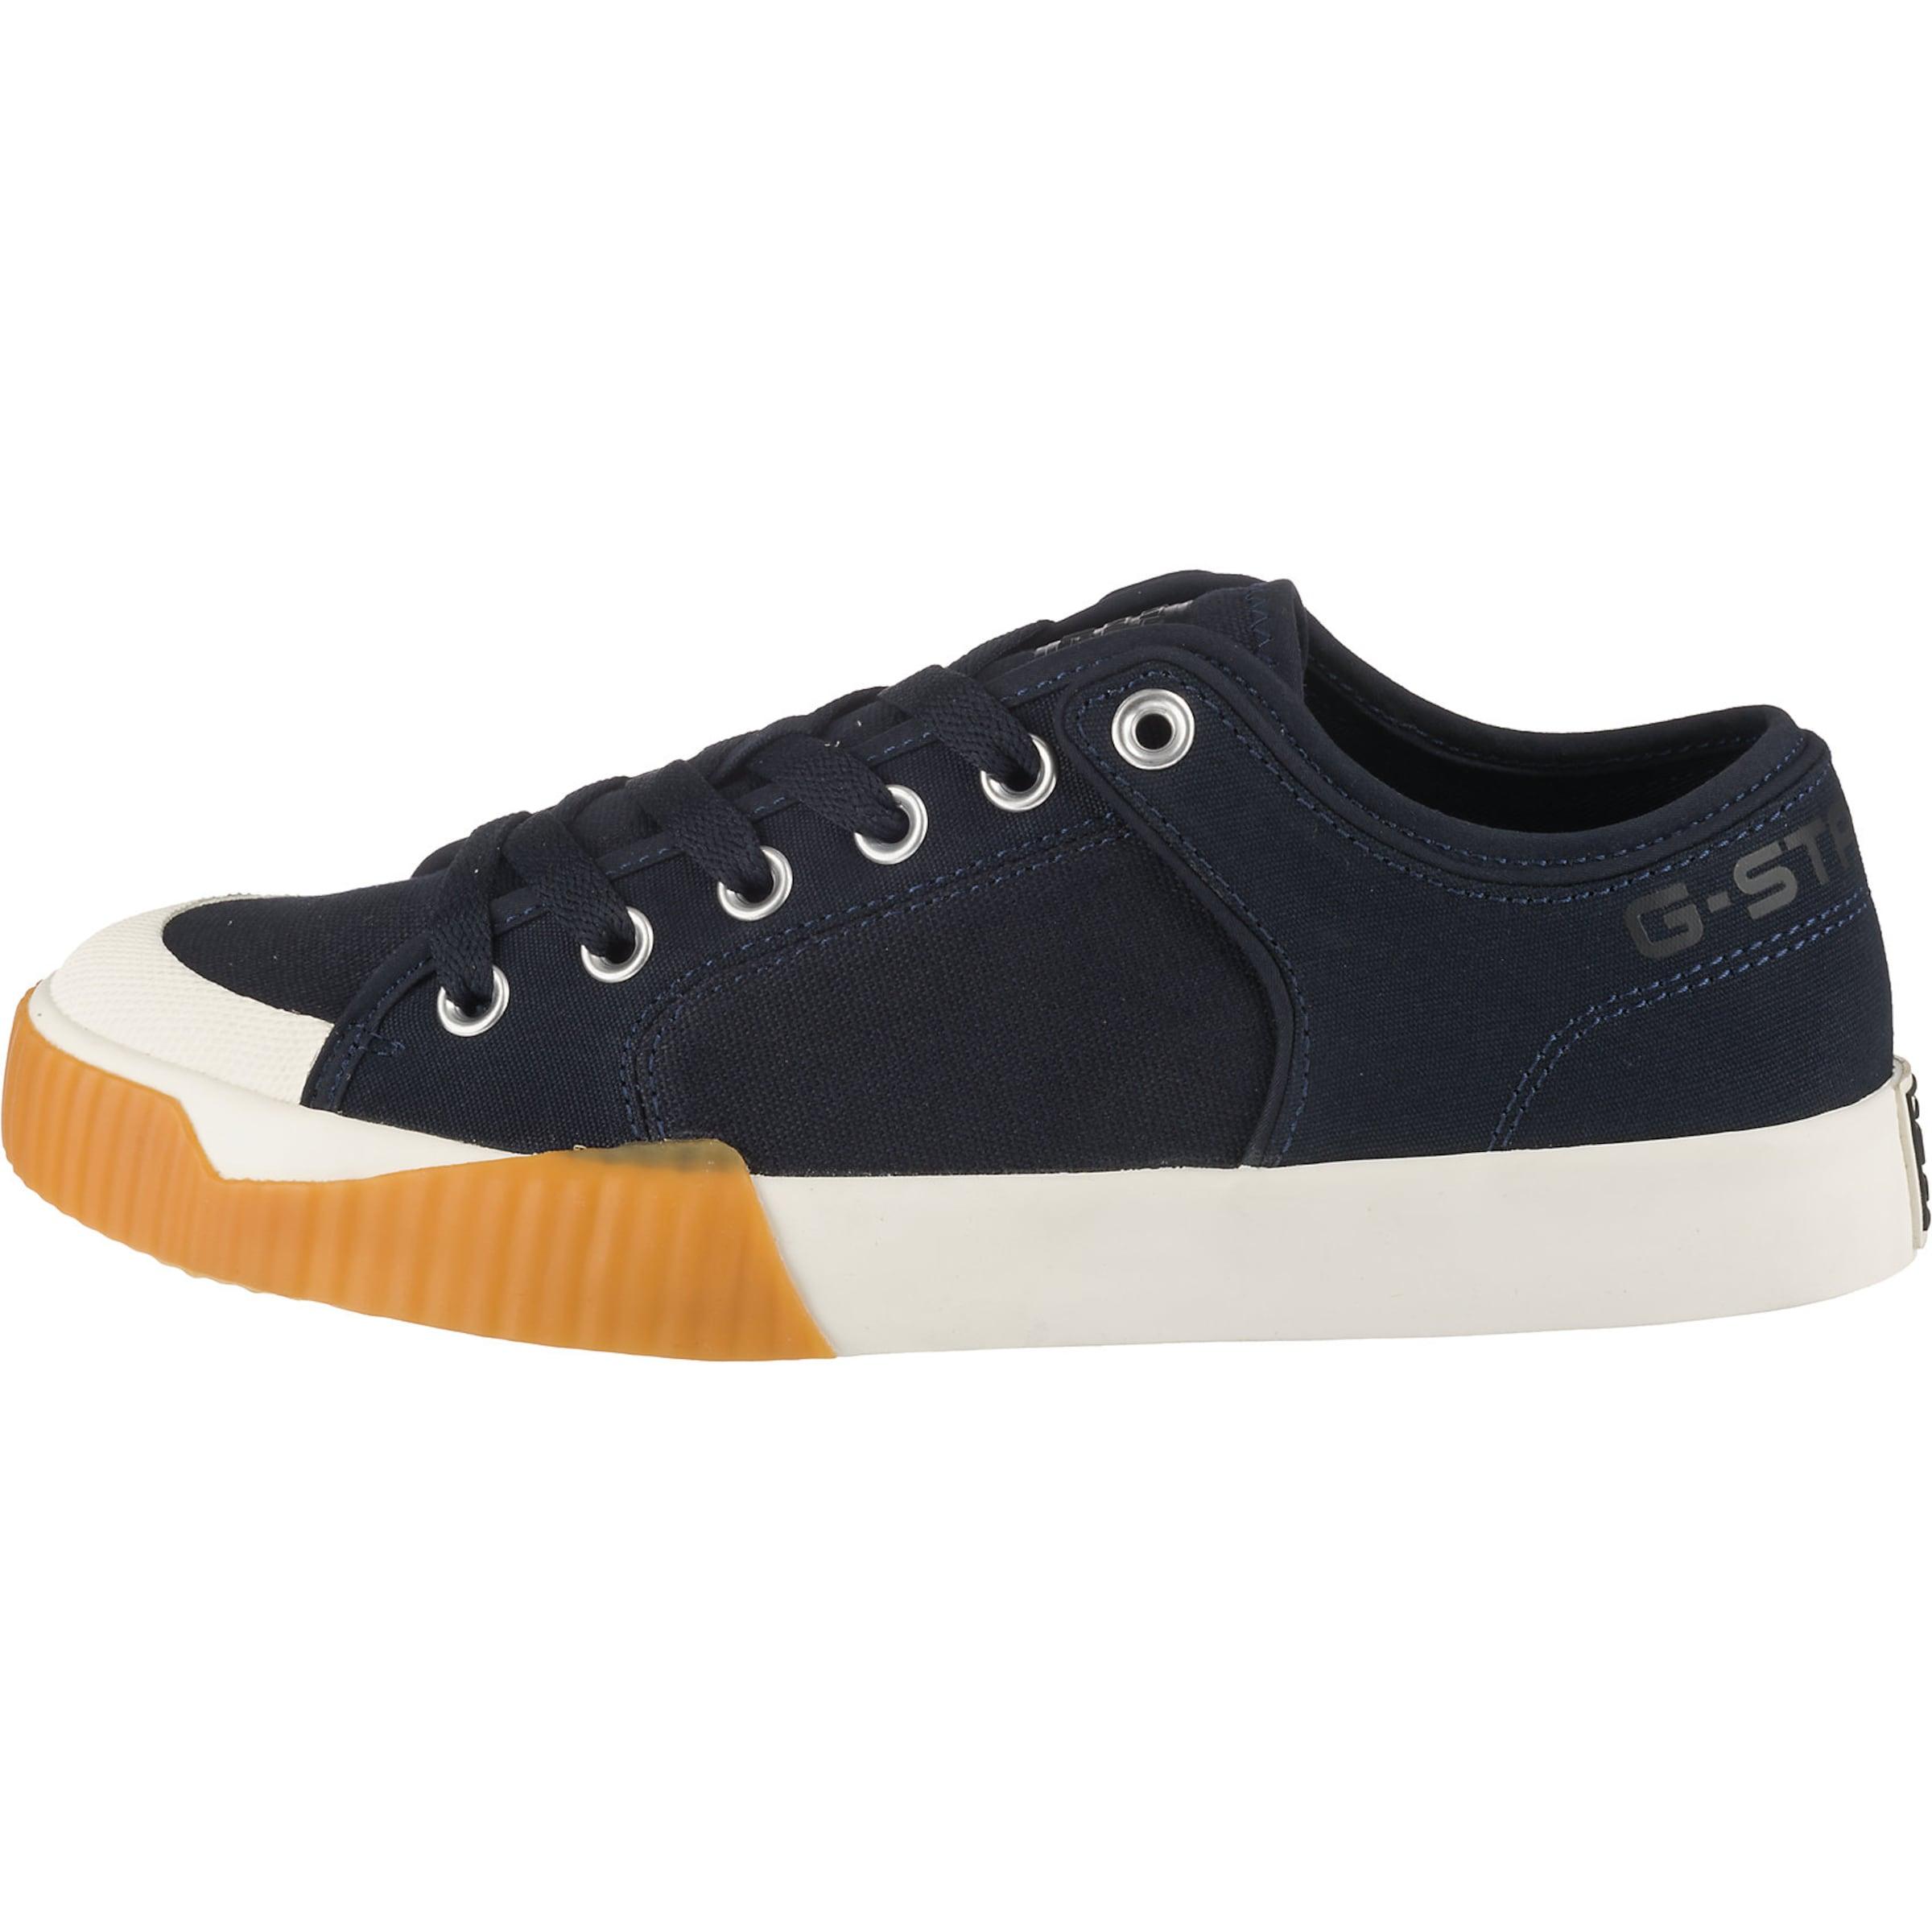 star In Raw Tendric' G Low Ultramarinblau Sneakers 'rackam hrCQtds